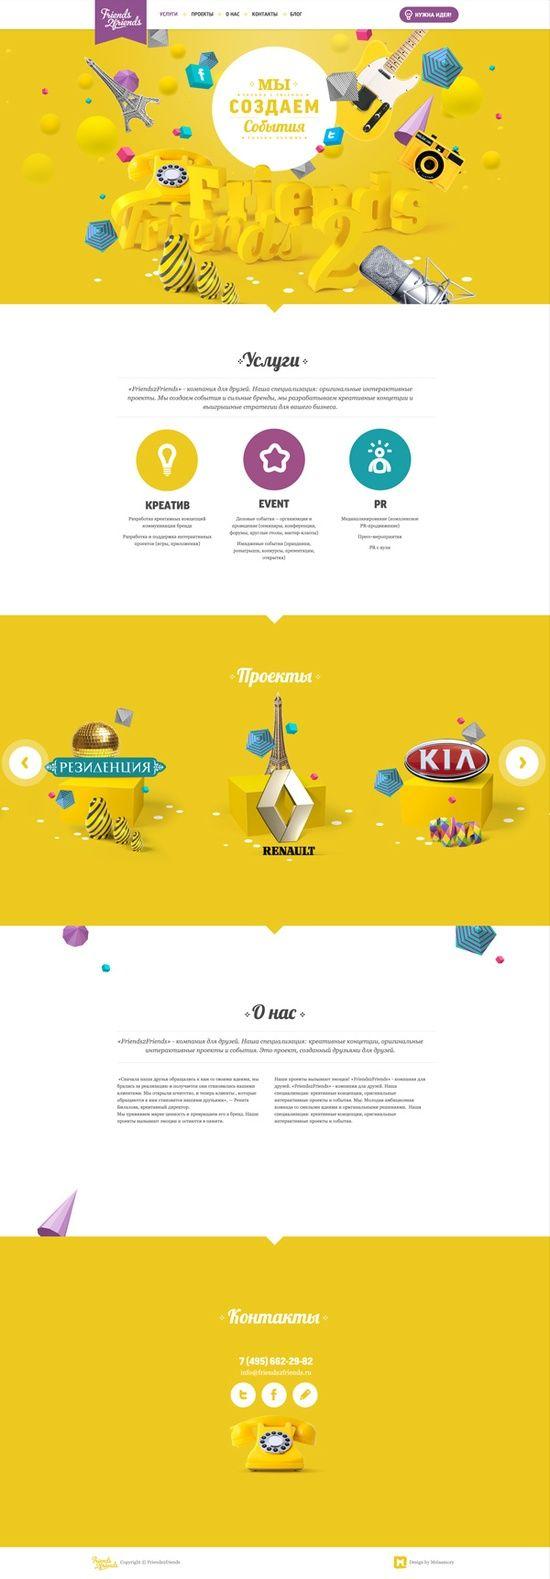 Web Design For Arkitektkopia Arkitektkopia Is A Nationwide Service In The Graphic Industry With Comprehensive Solutions Consisting Of Services Applications A Diseno Web Disenos De Unas Interfaz De Usuario